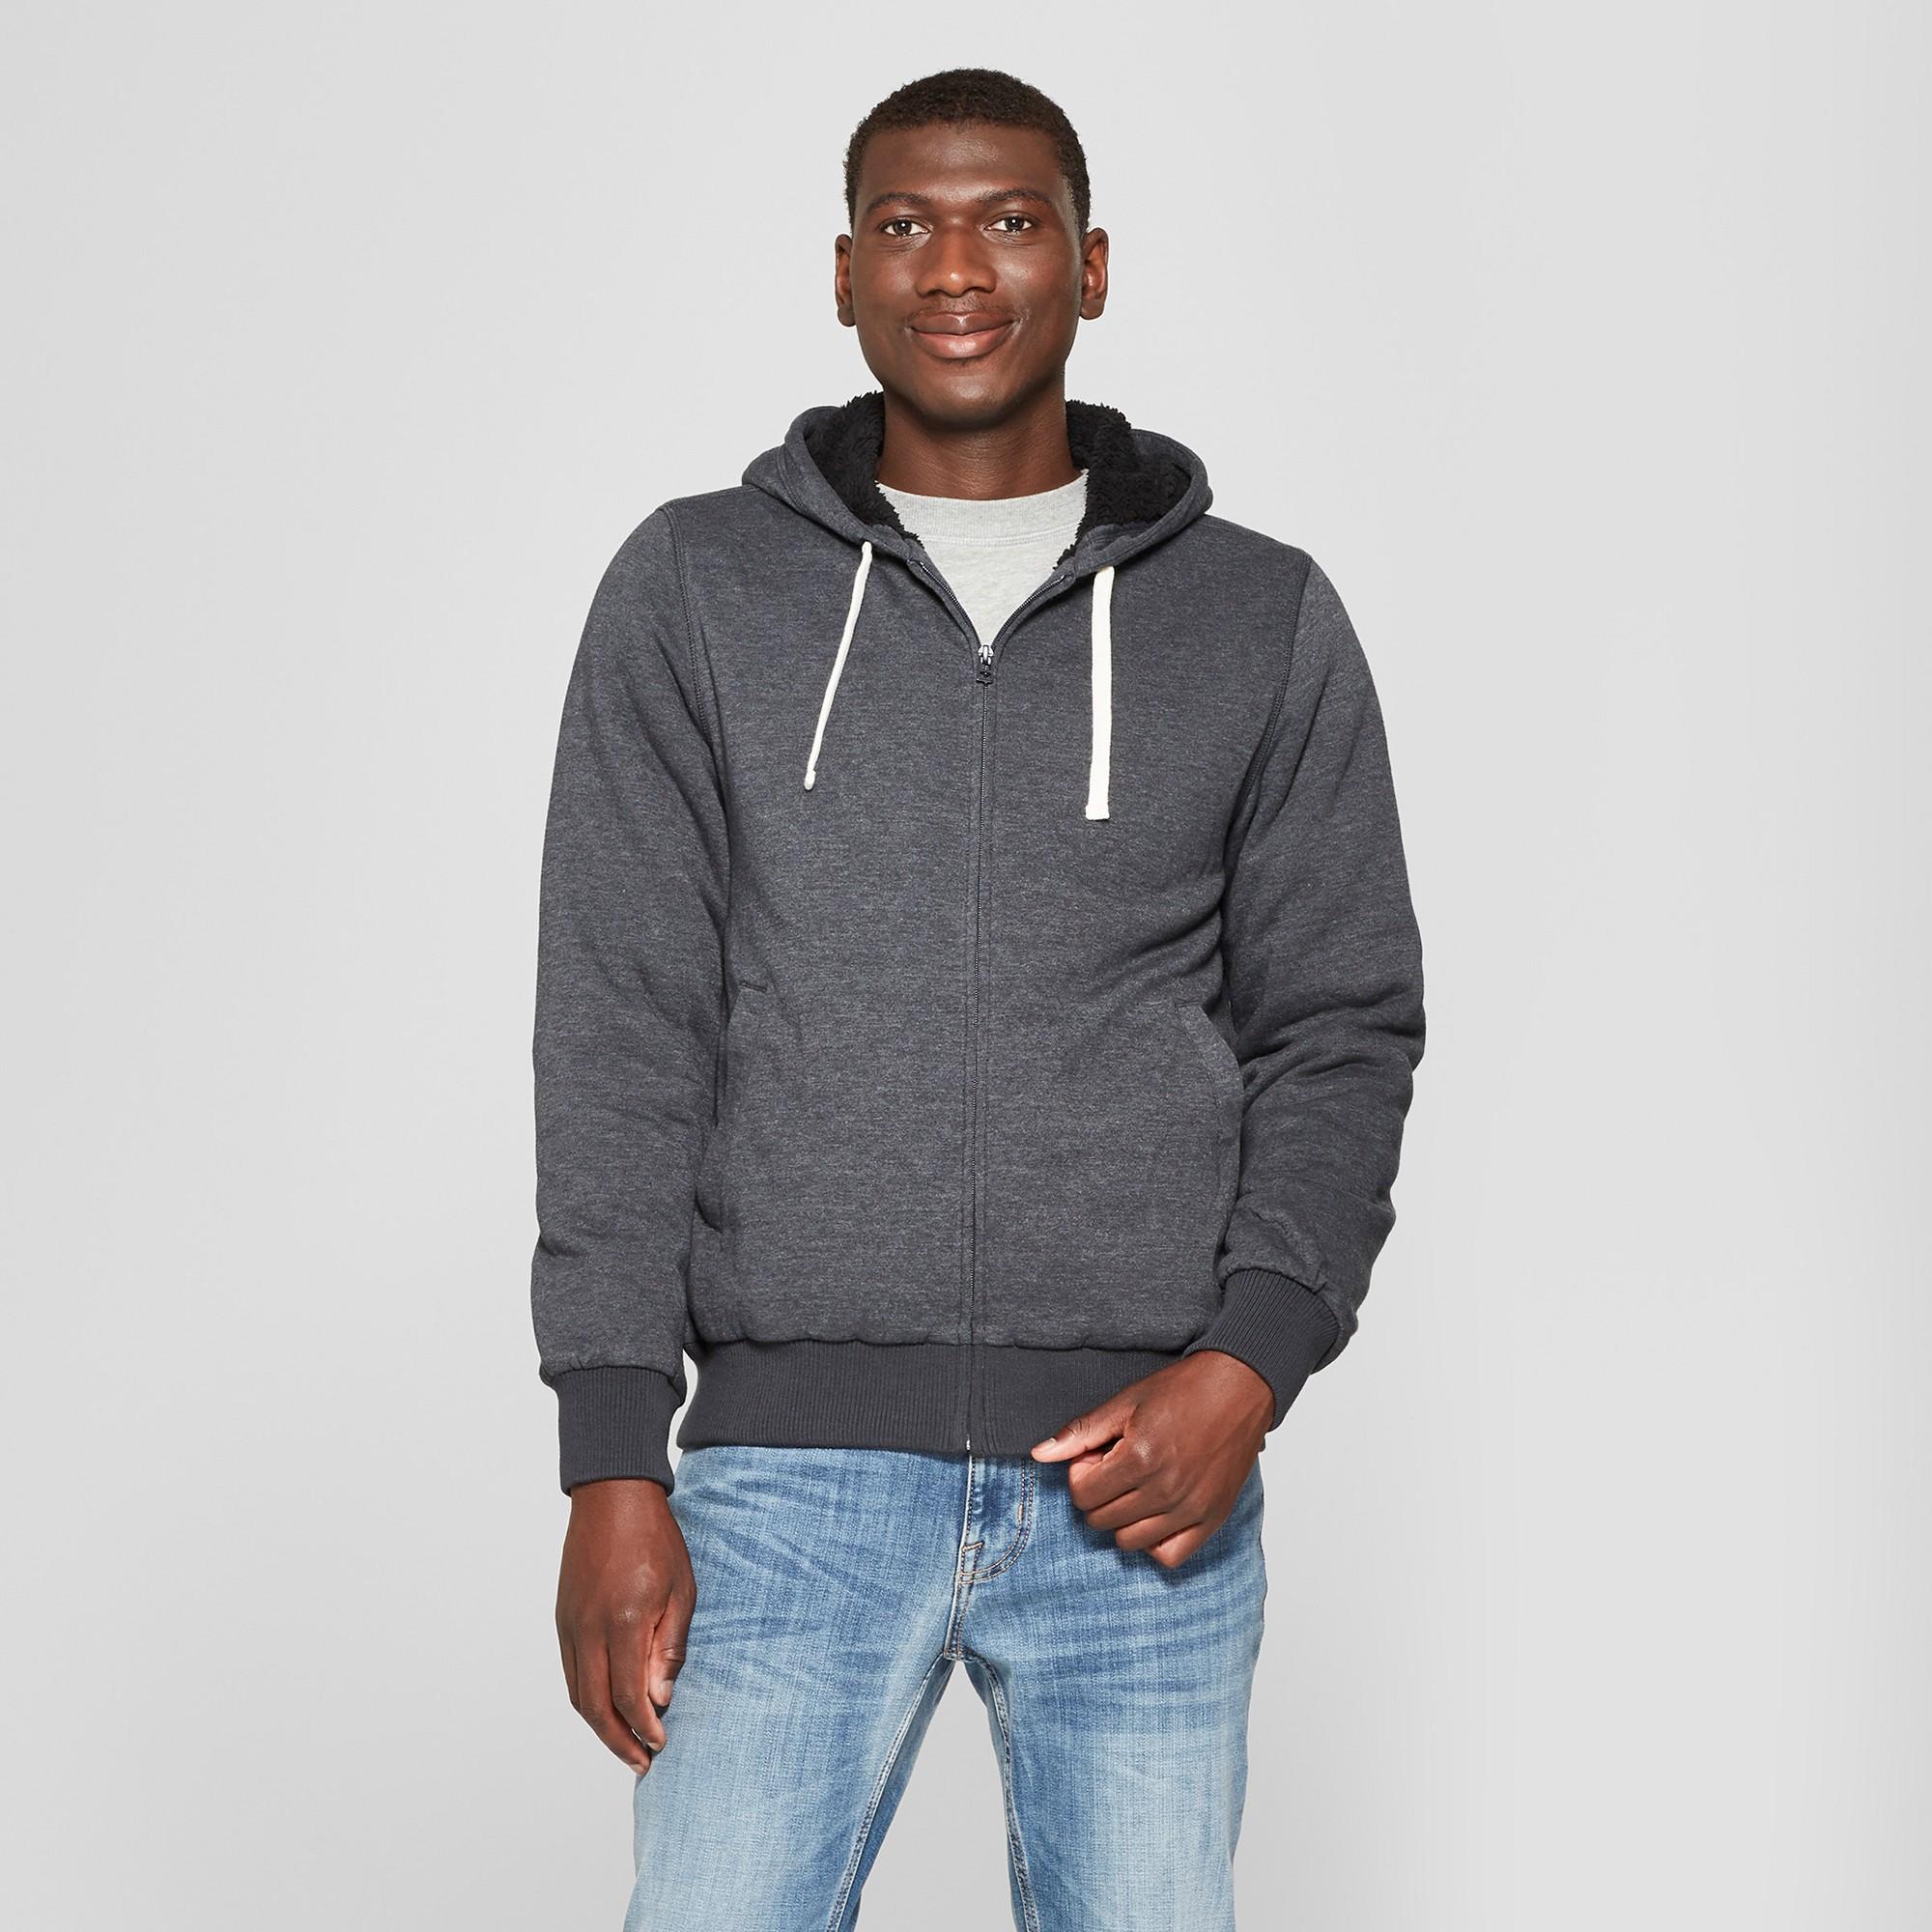 Menus sherpa fleece jacket goodfellow u co black xl mens fleece